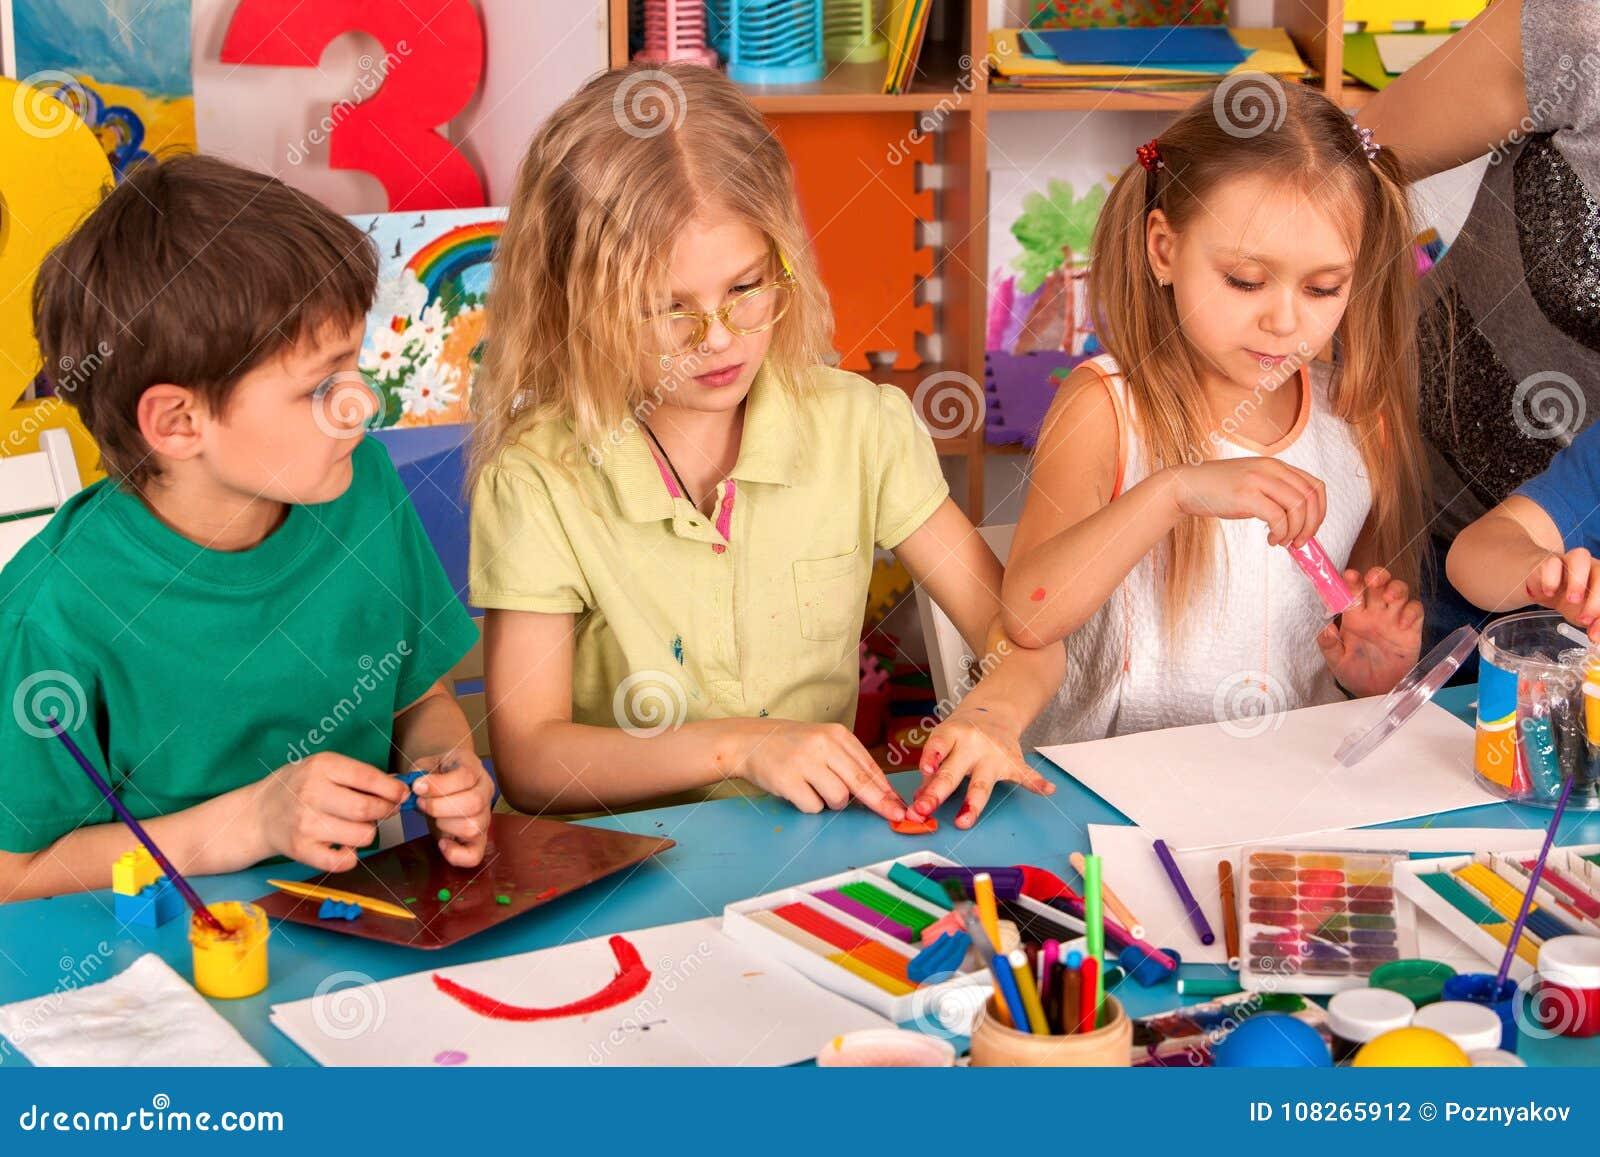 Child dough play in school. Plasticine for children.